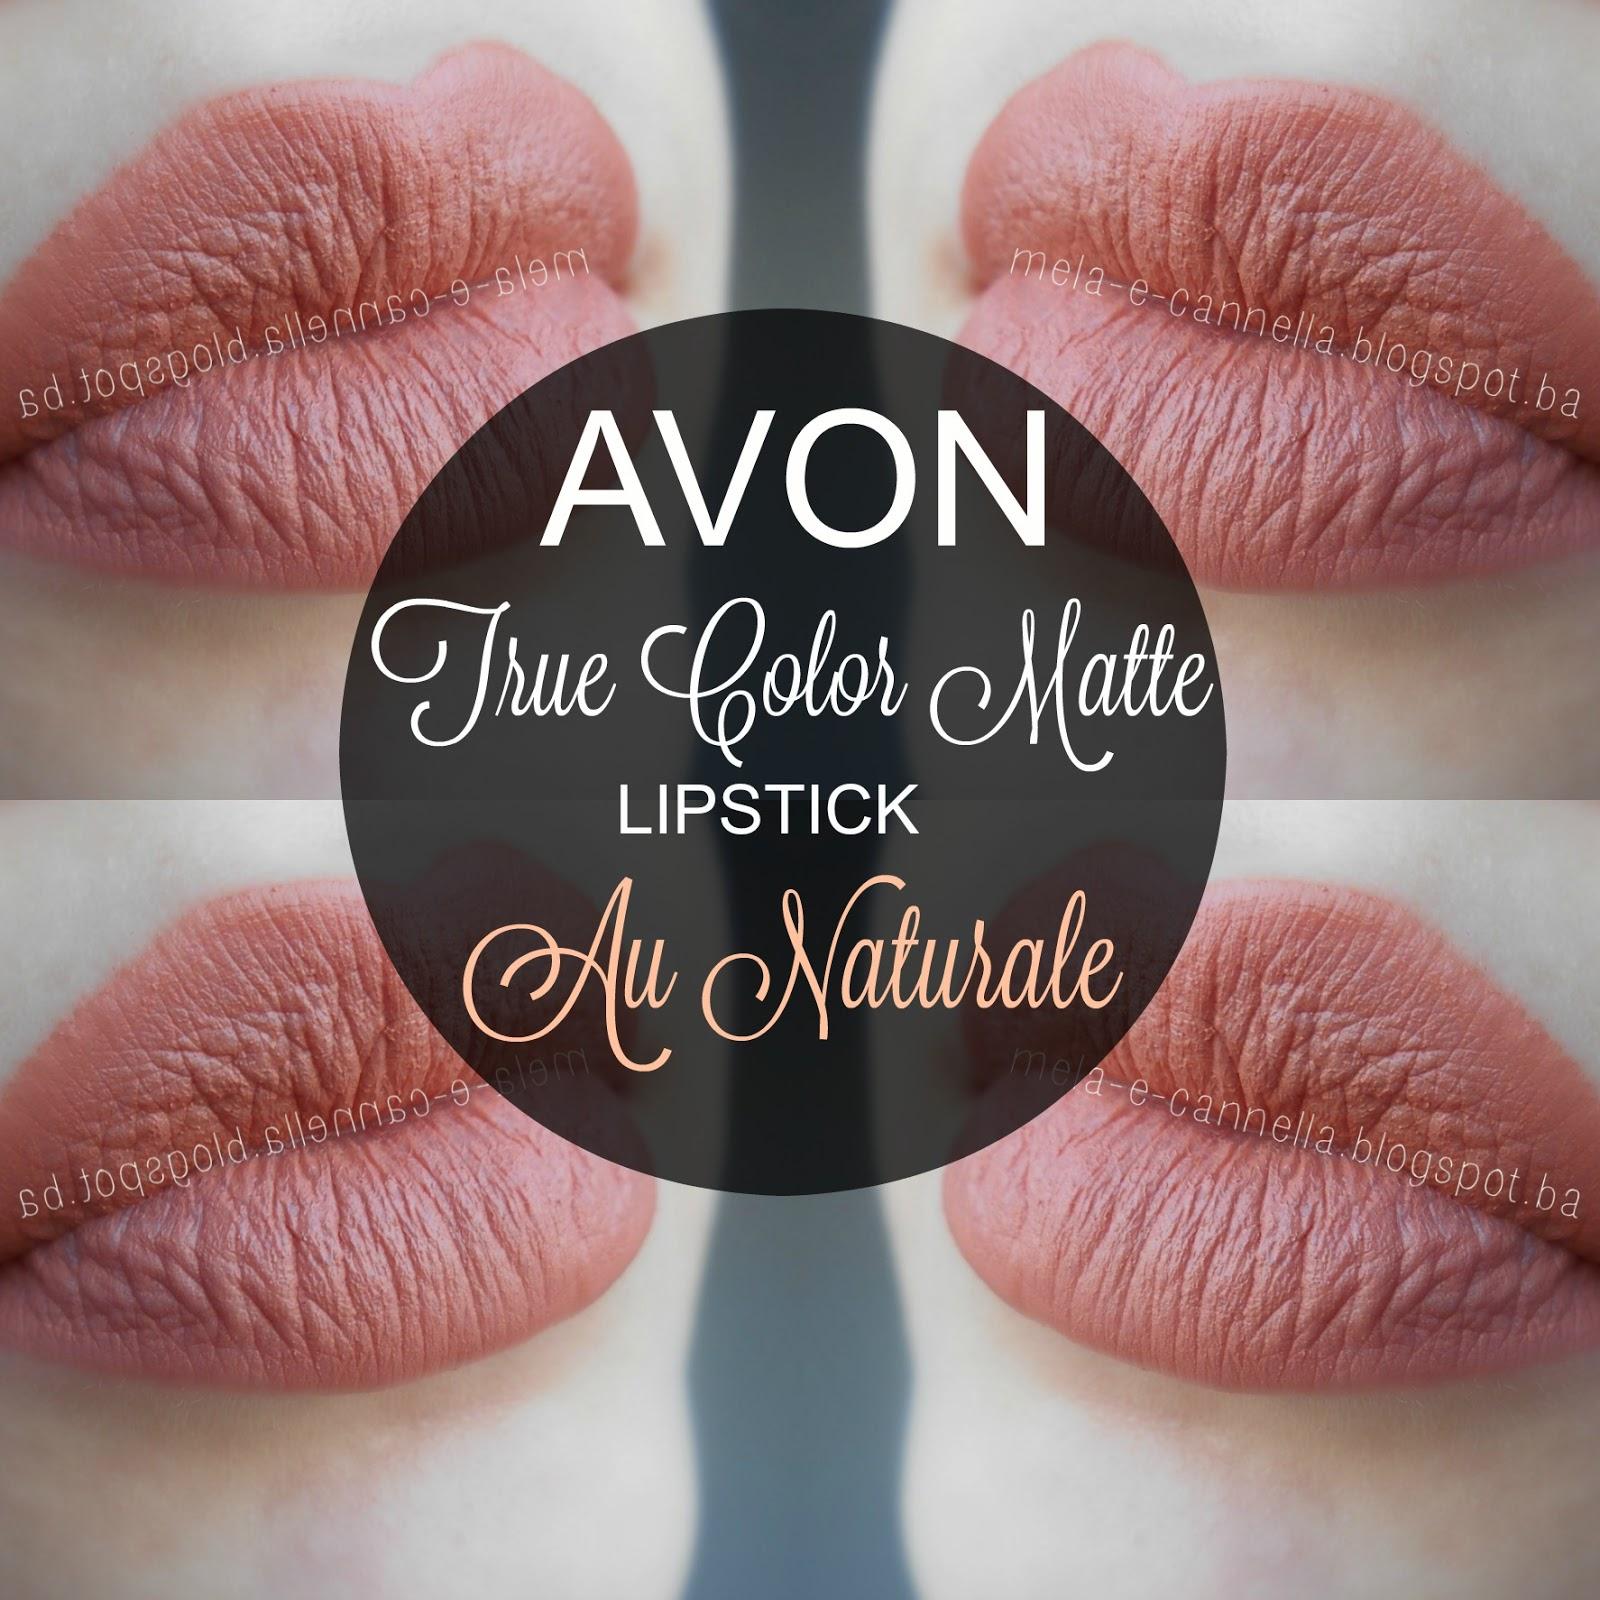 Natural Color Lipstick For Dark Lips